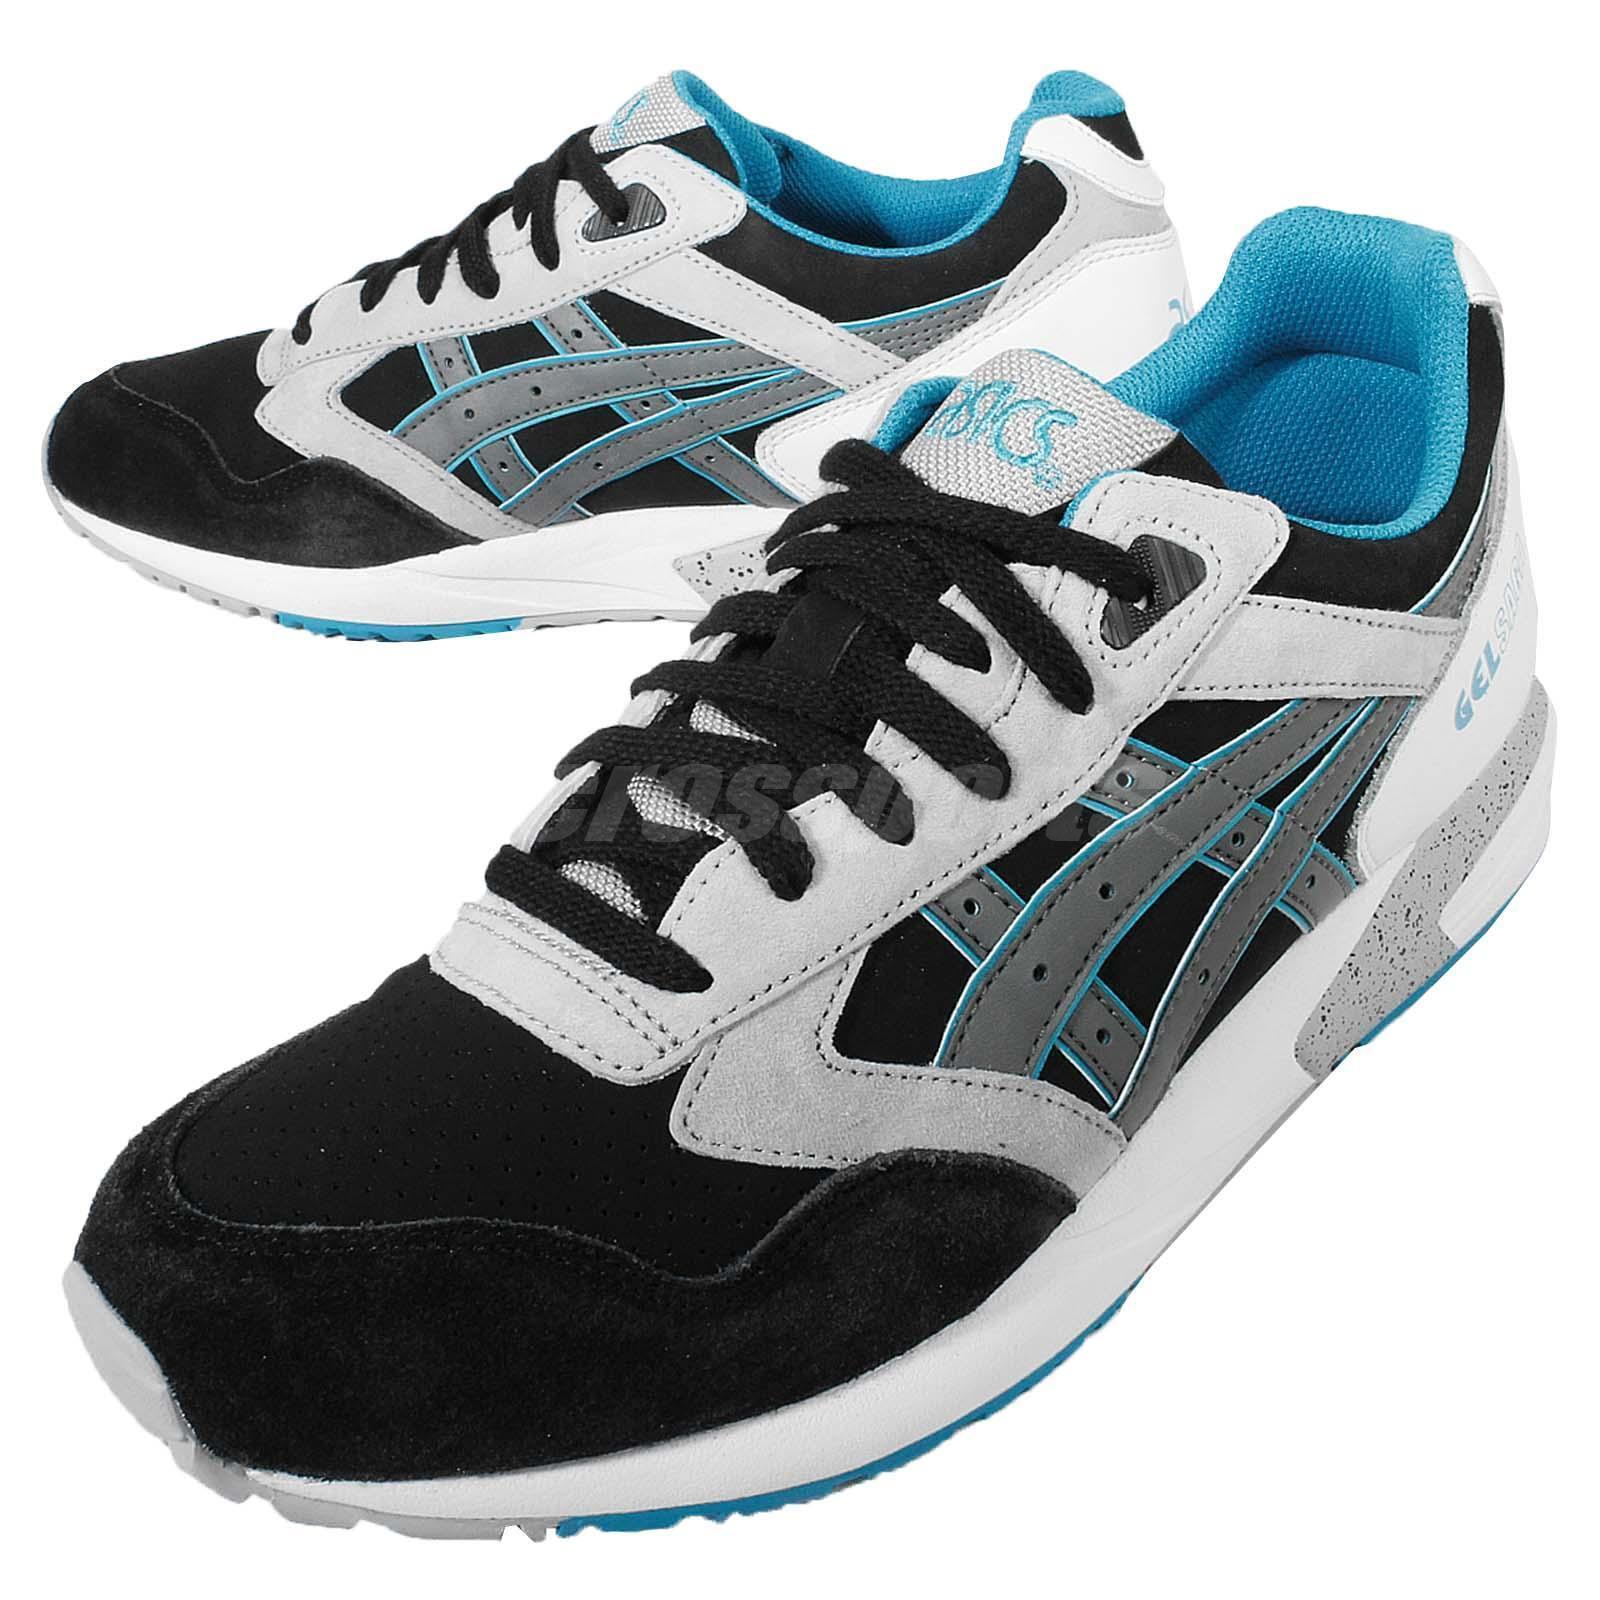 Asics Tiger Gel Saga Black Grey Blue Mens Running Shoes  H648L-9011 US SIZE 9